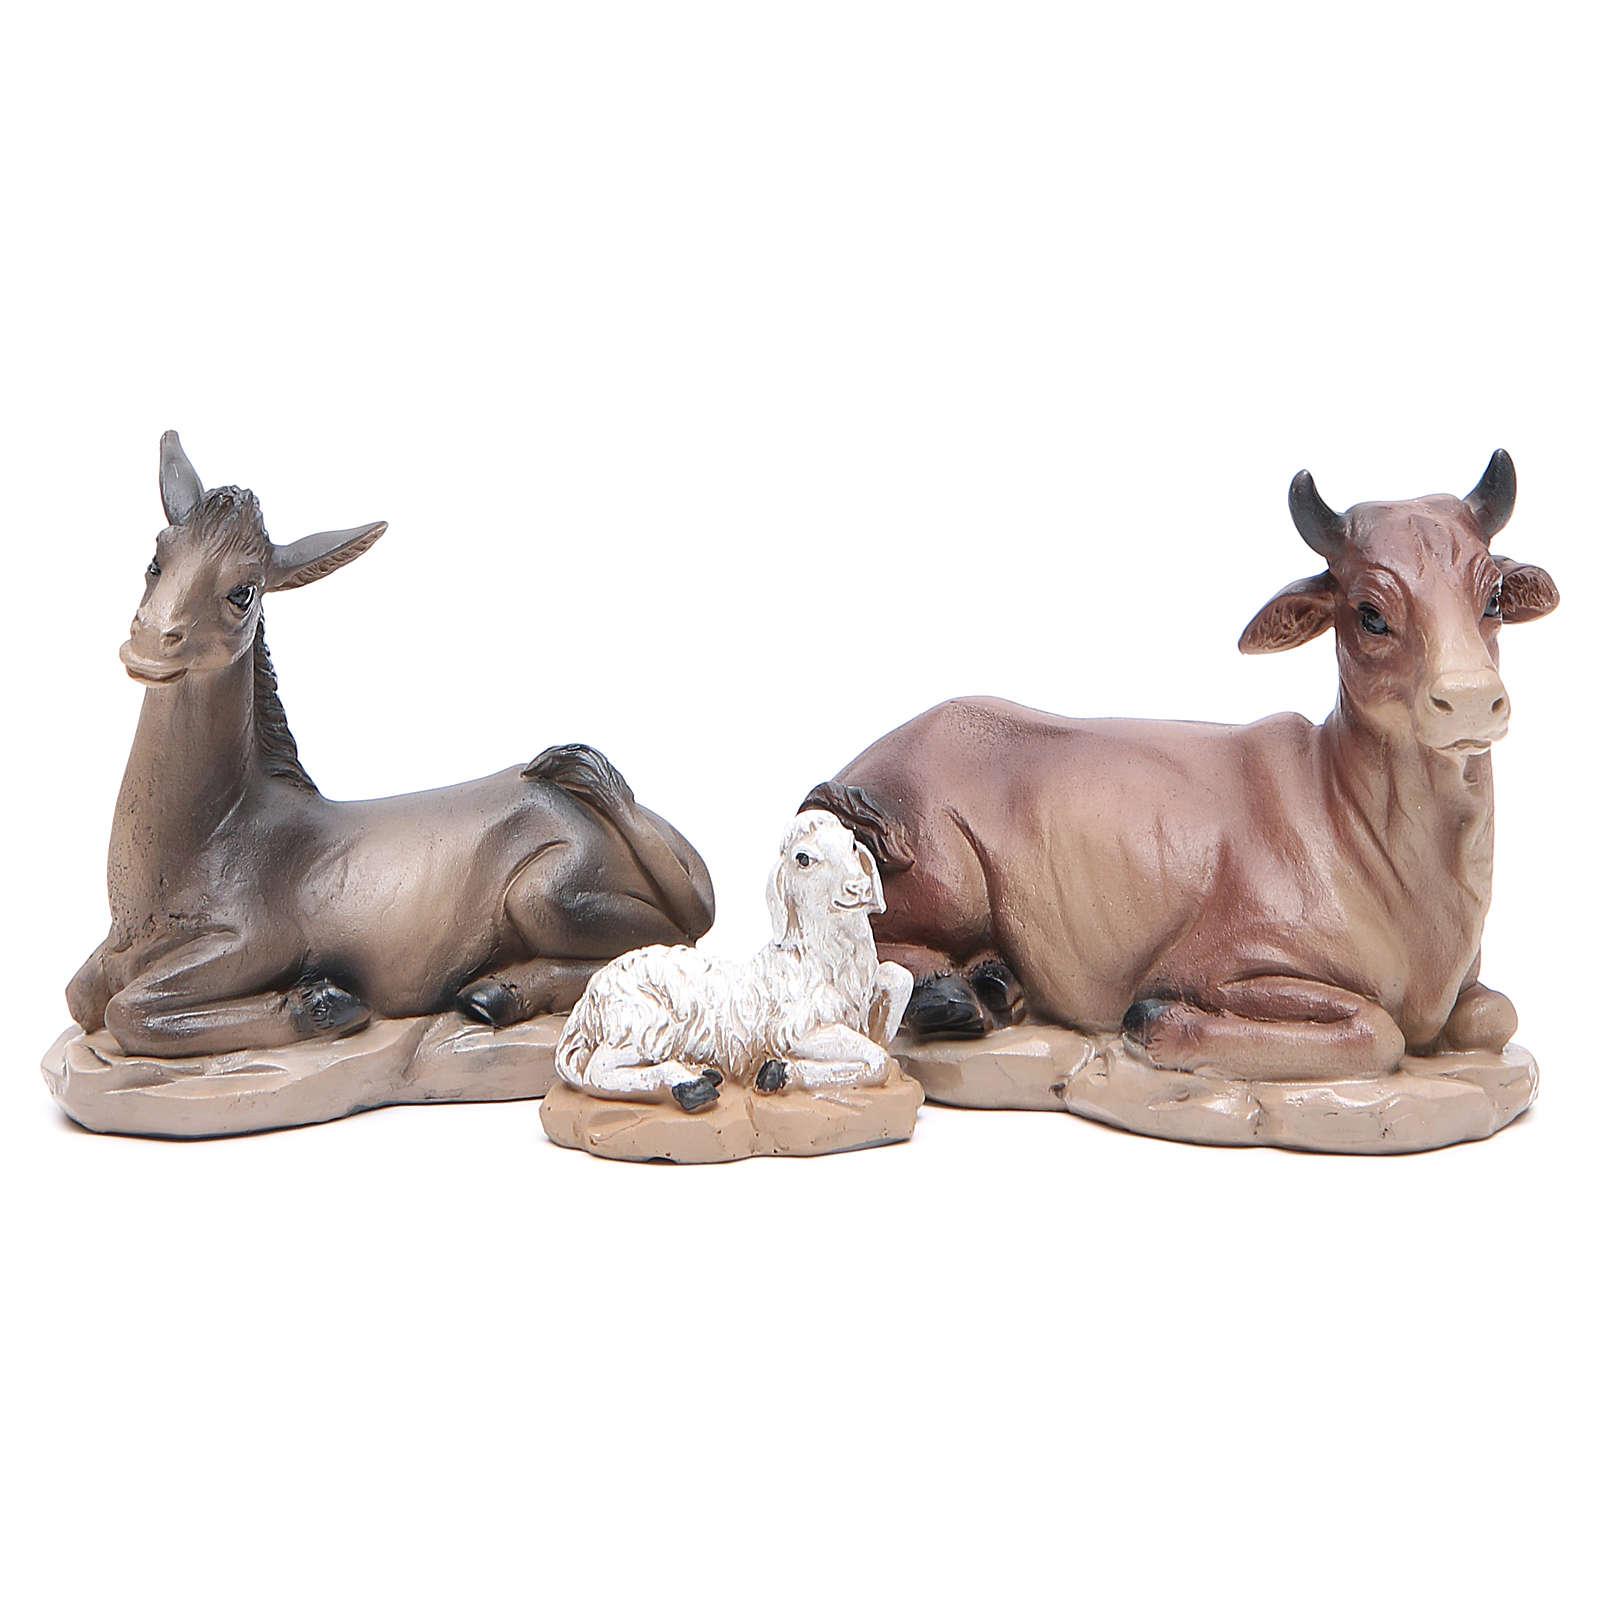 Resin nativity set measuring 20cm, 11 figurines in Wood-like effect 4